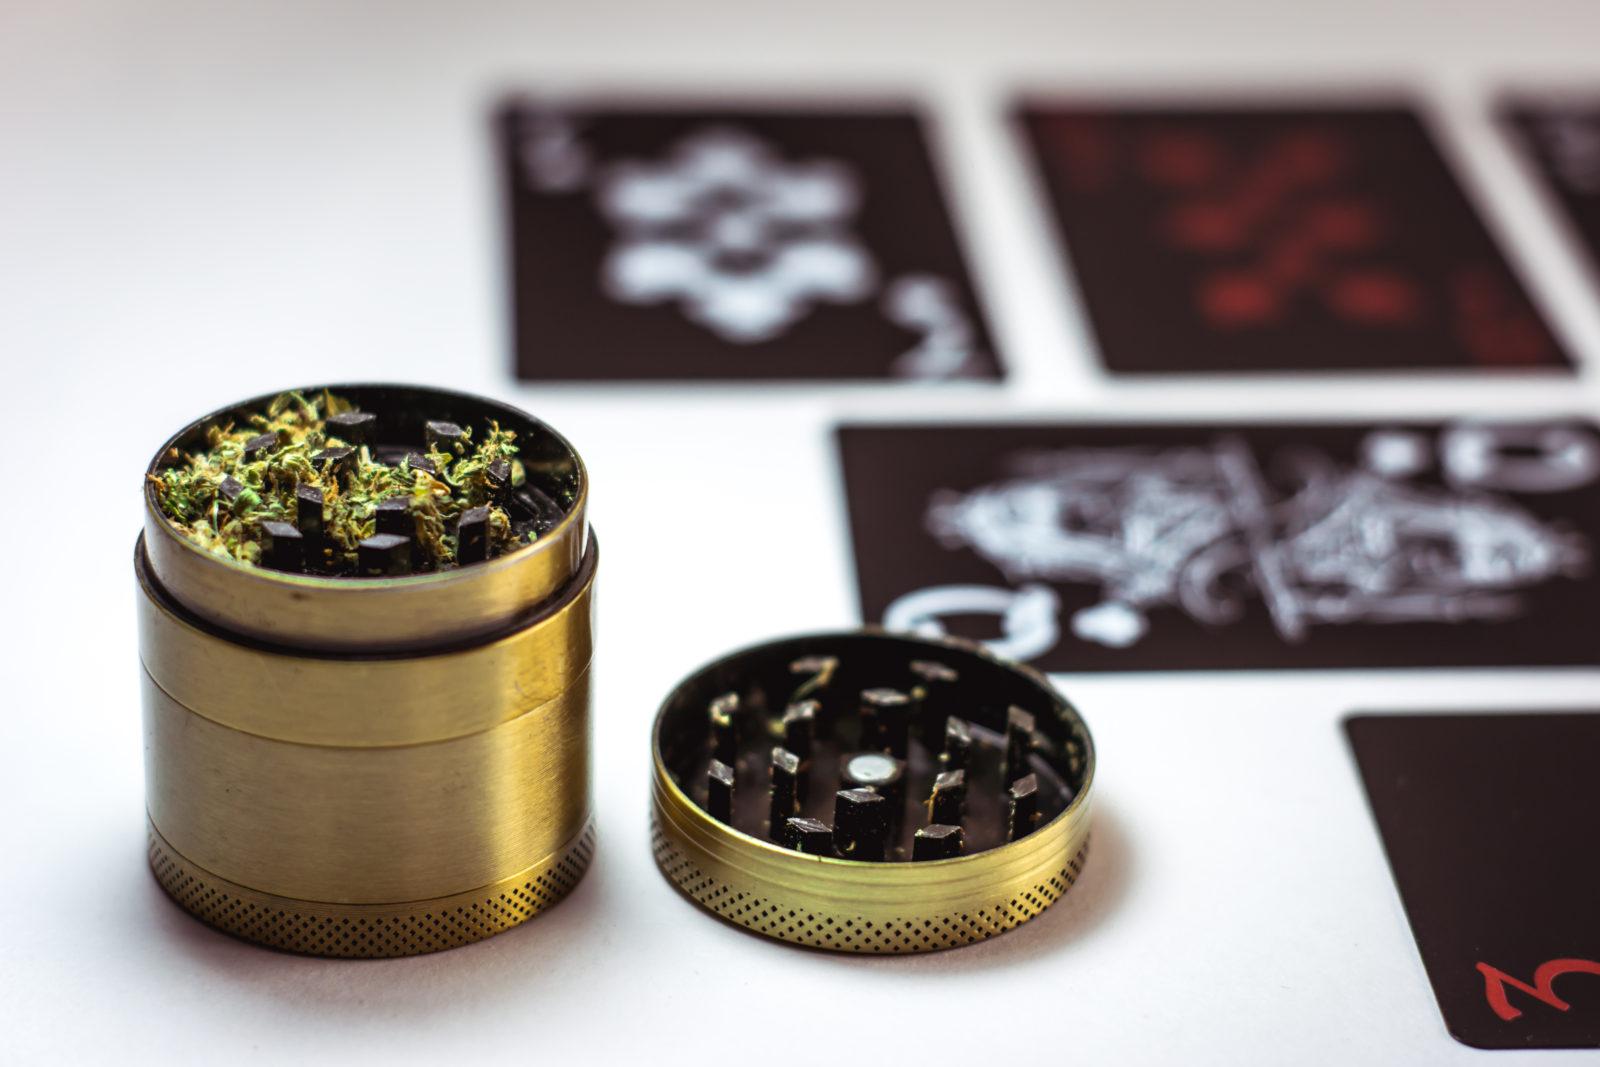 cannabis grinder in gold